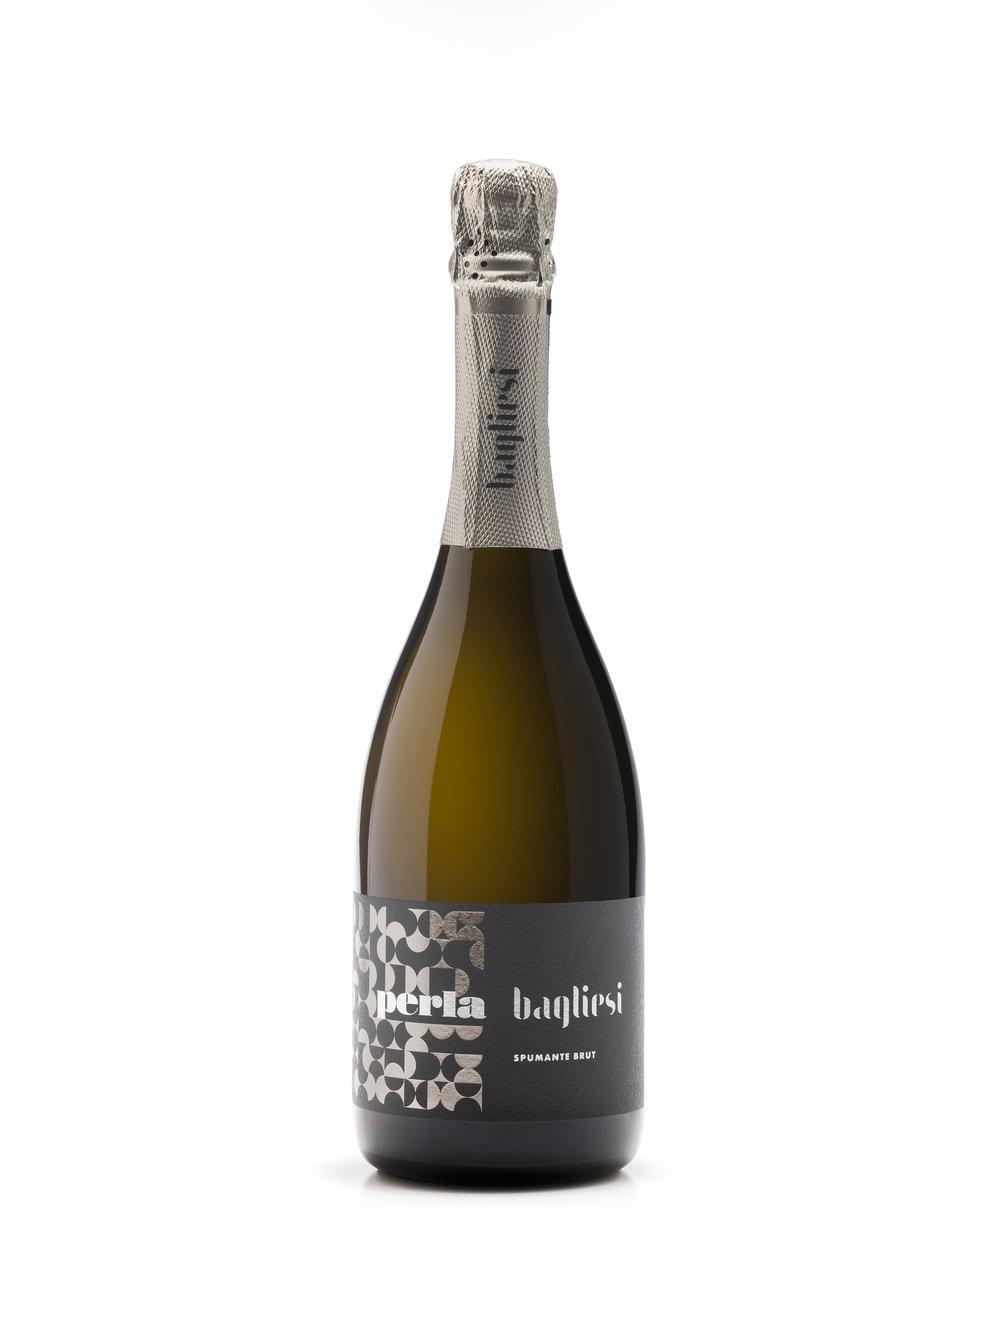 Vintage Label for Sparkling Wine Catarratto Brut by Azienda Agricola Bagliesi